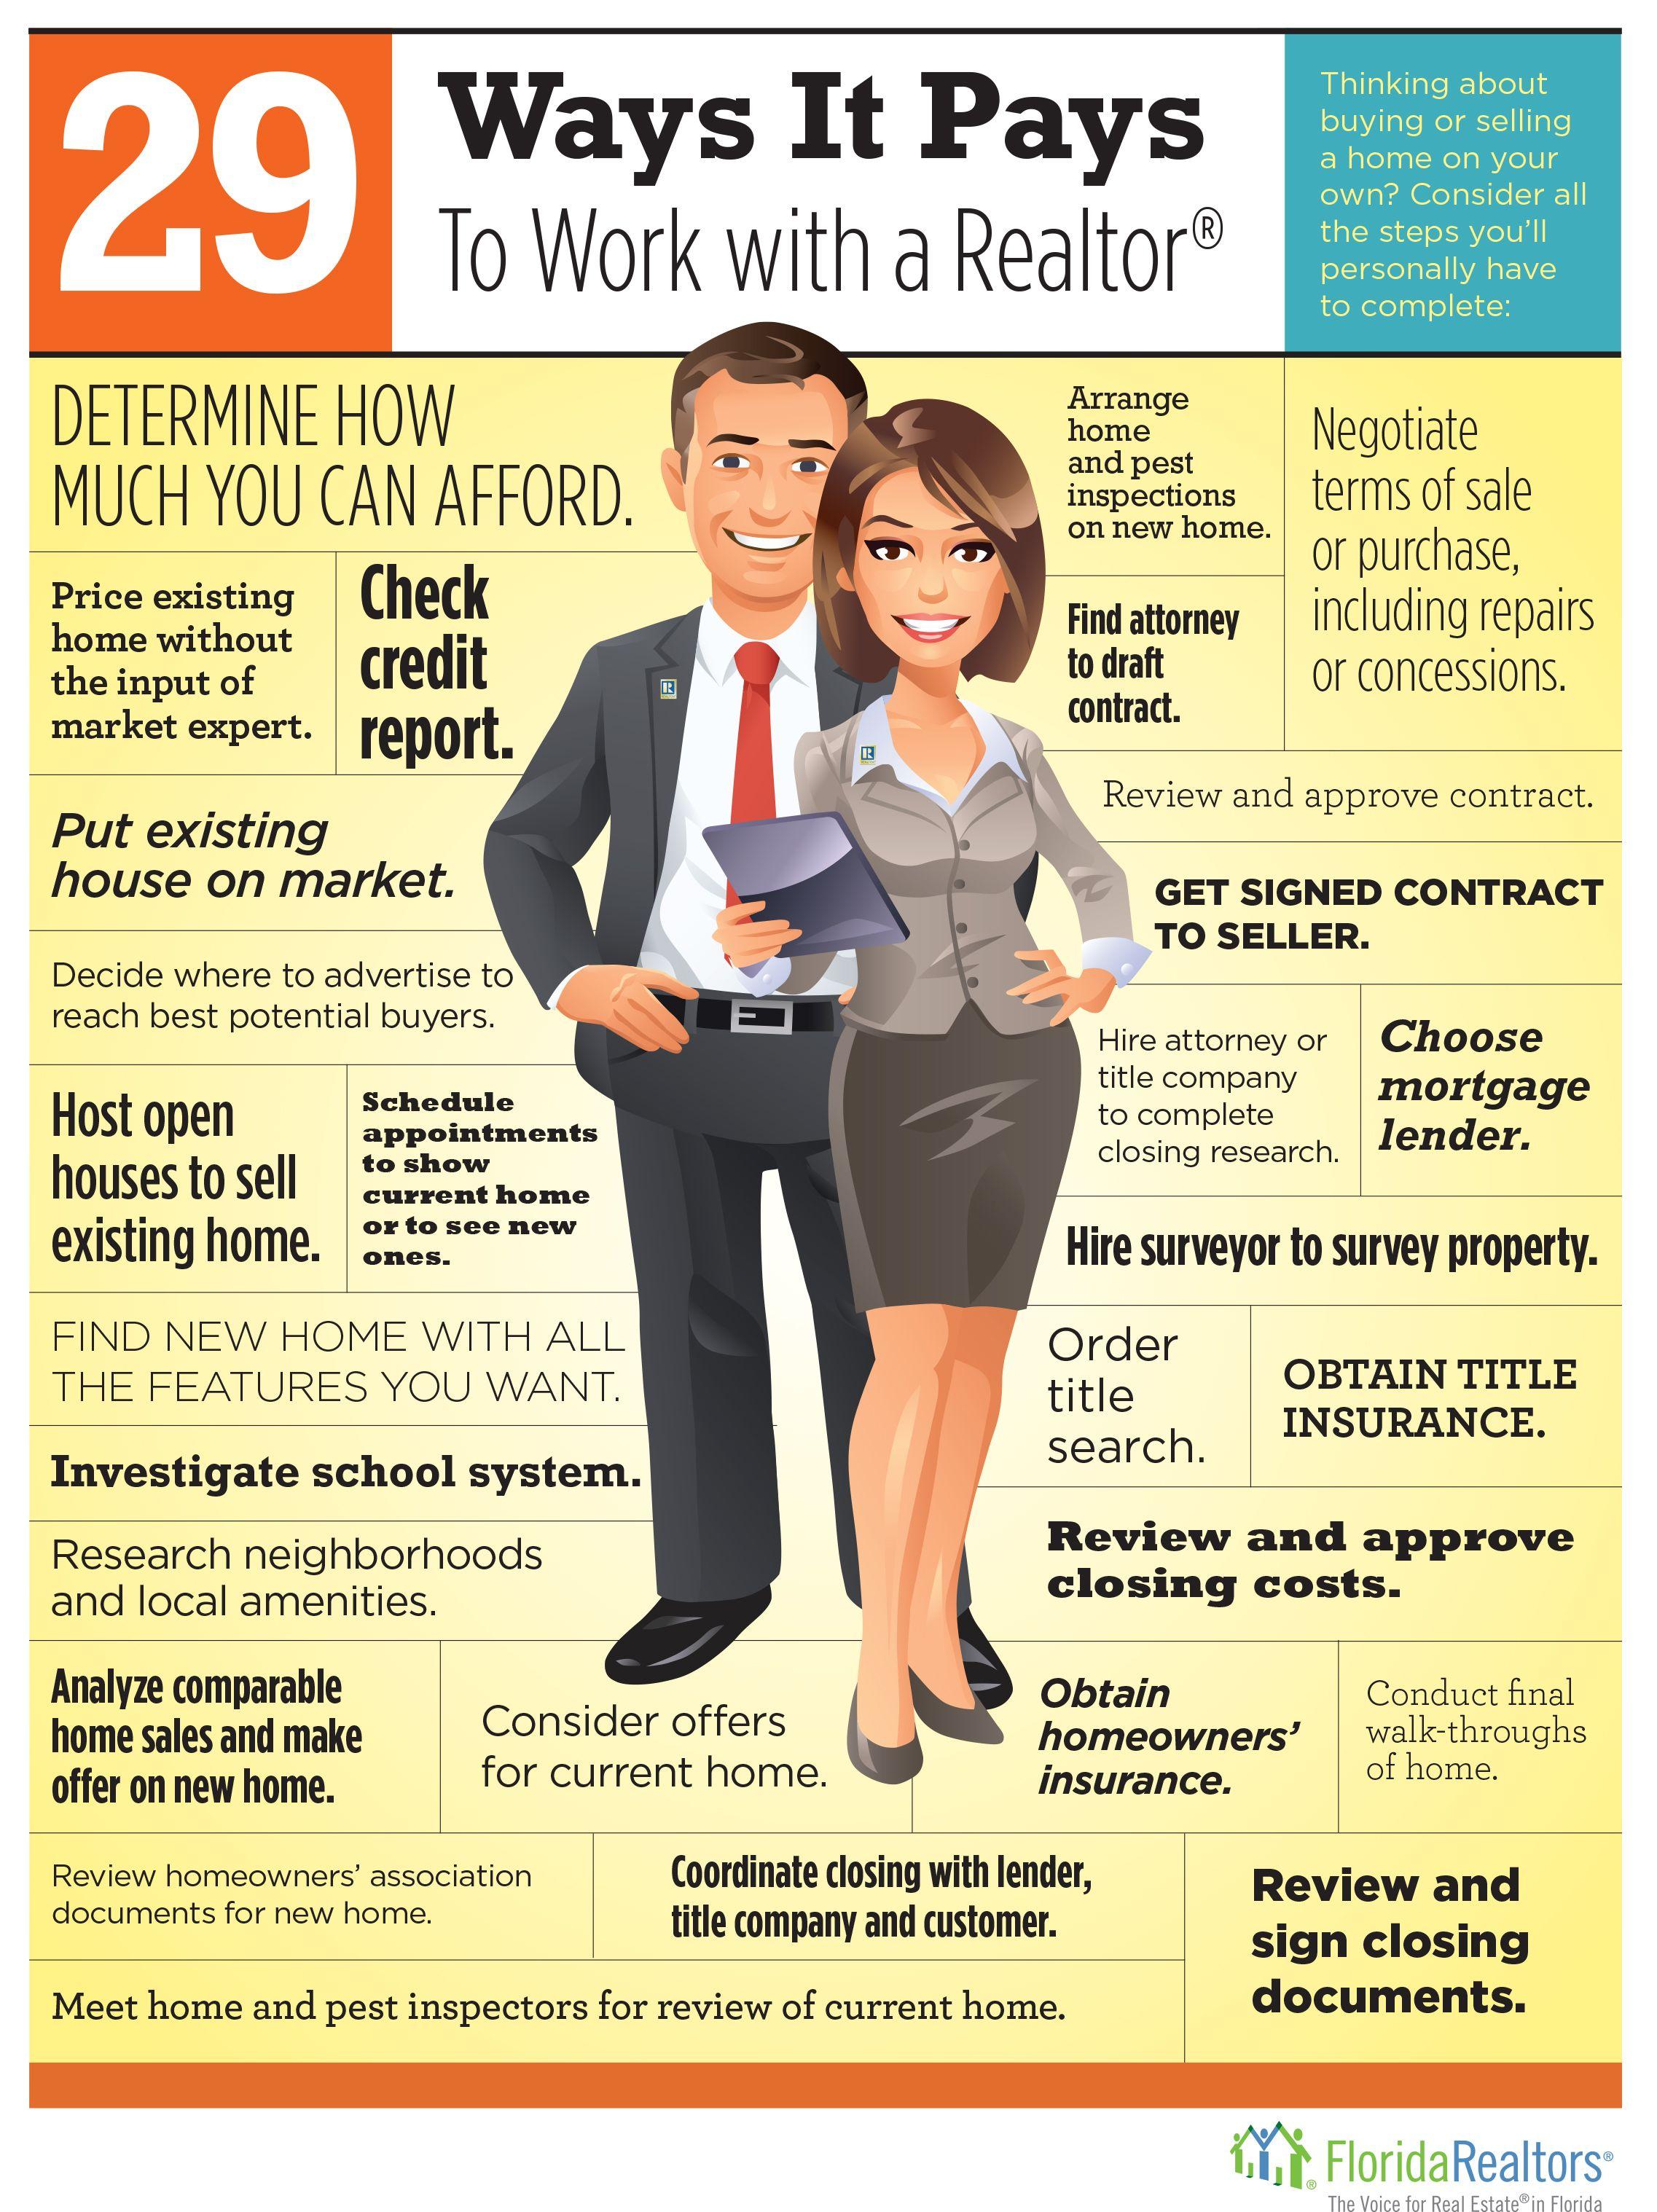 Florida Realtor Magazine Current Issue Tampa Real Estate Real Estate Tips Real Estate Agent Marketing